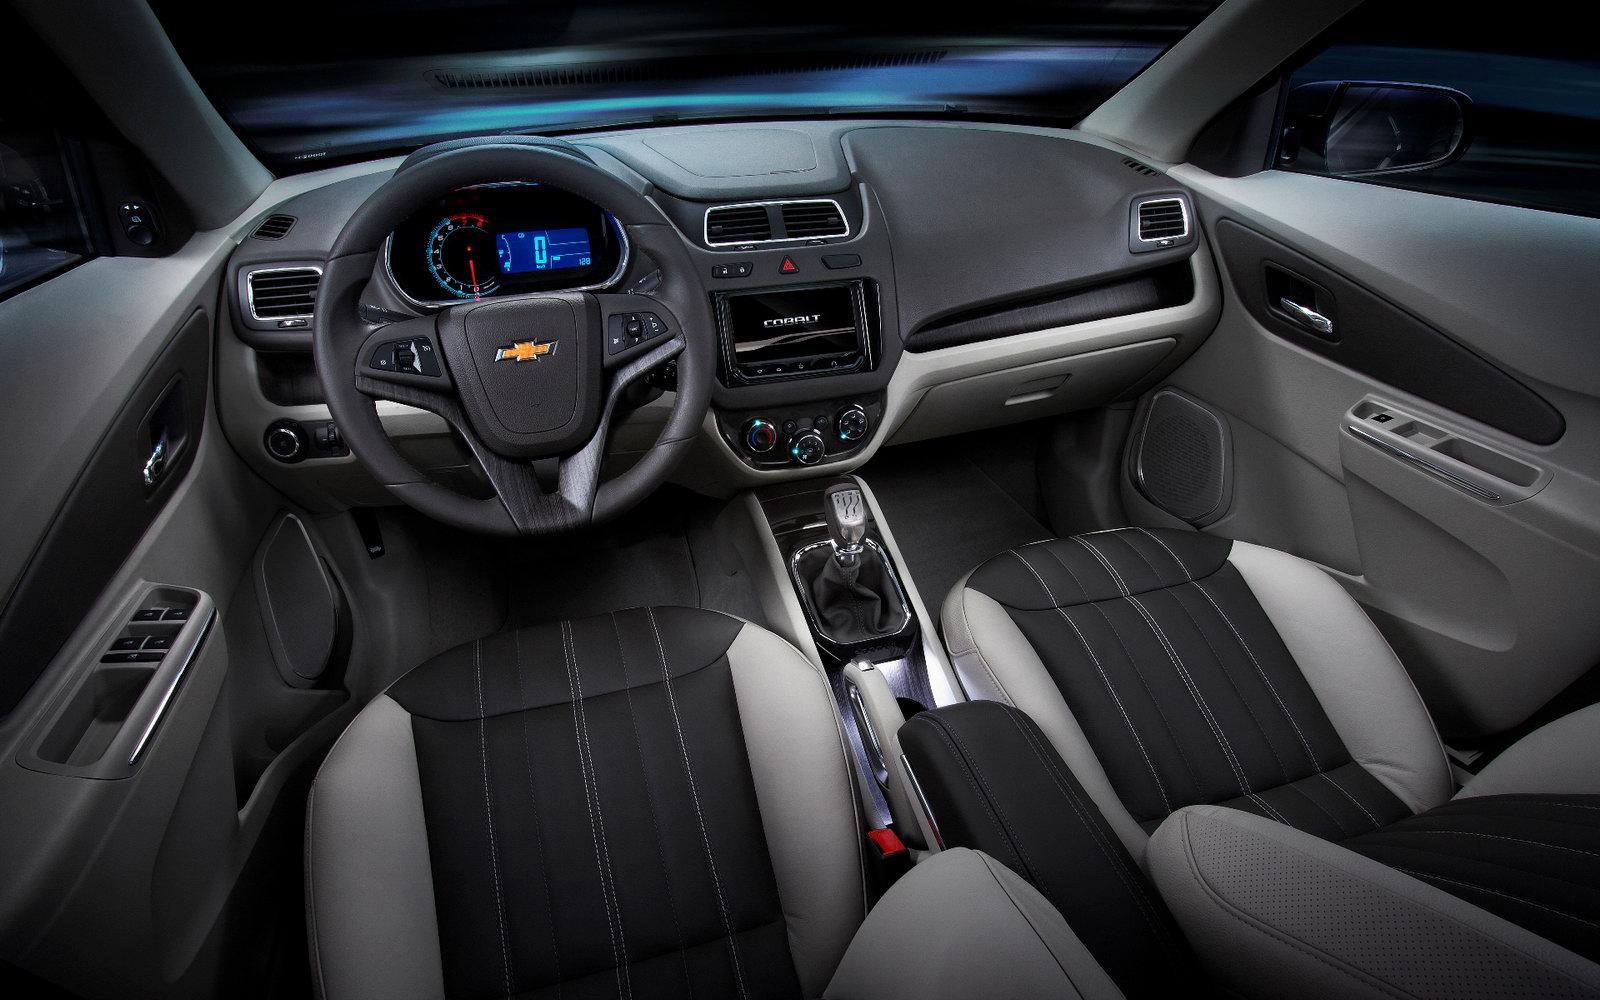 New Chevrolet Cobalt Sedan Concept Unveiled In Buenos